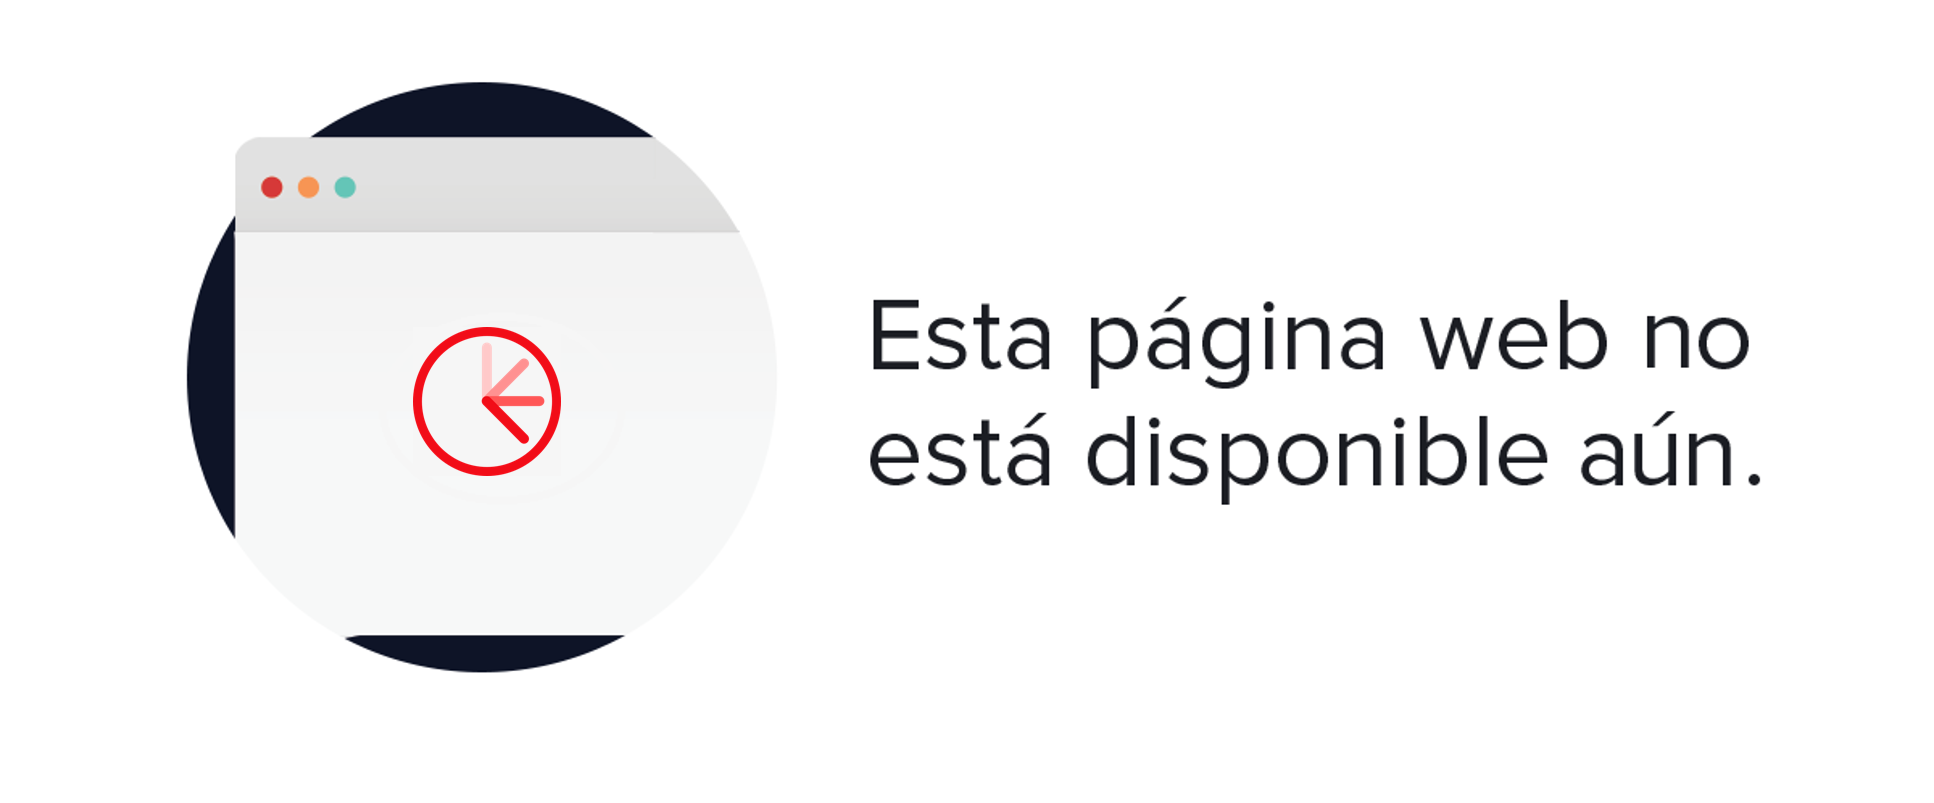 Parallels-desktop-11-2-0-32581-business-edition-mac-osx